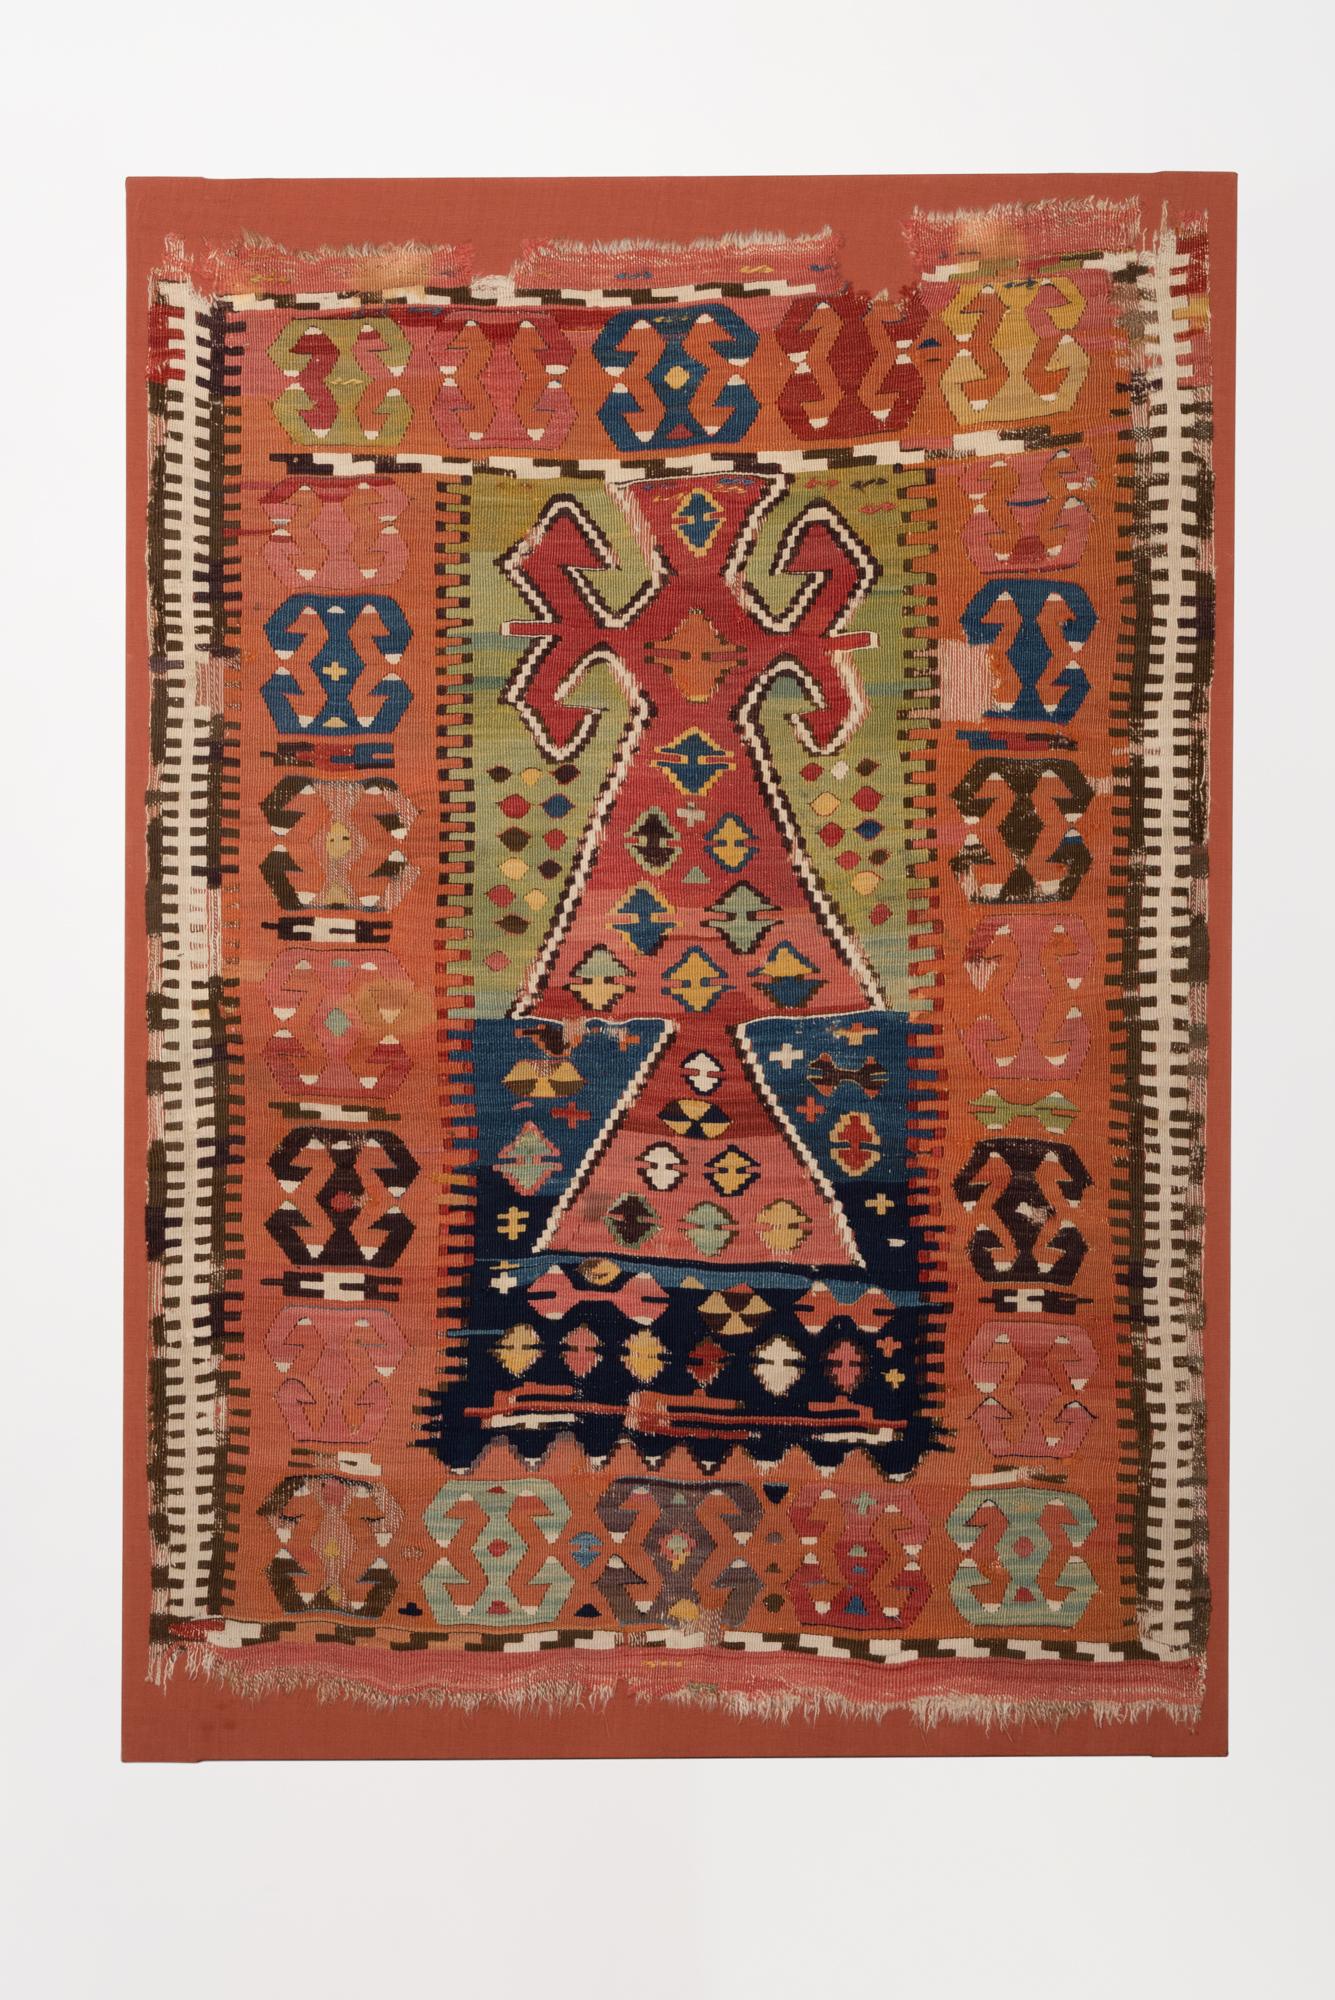 Woven wool prayer kilim from Cappadocia